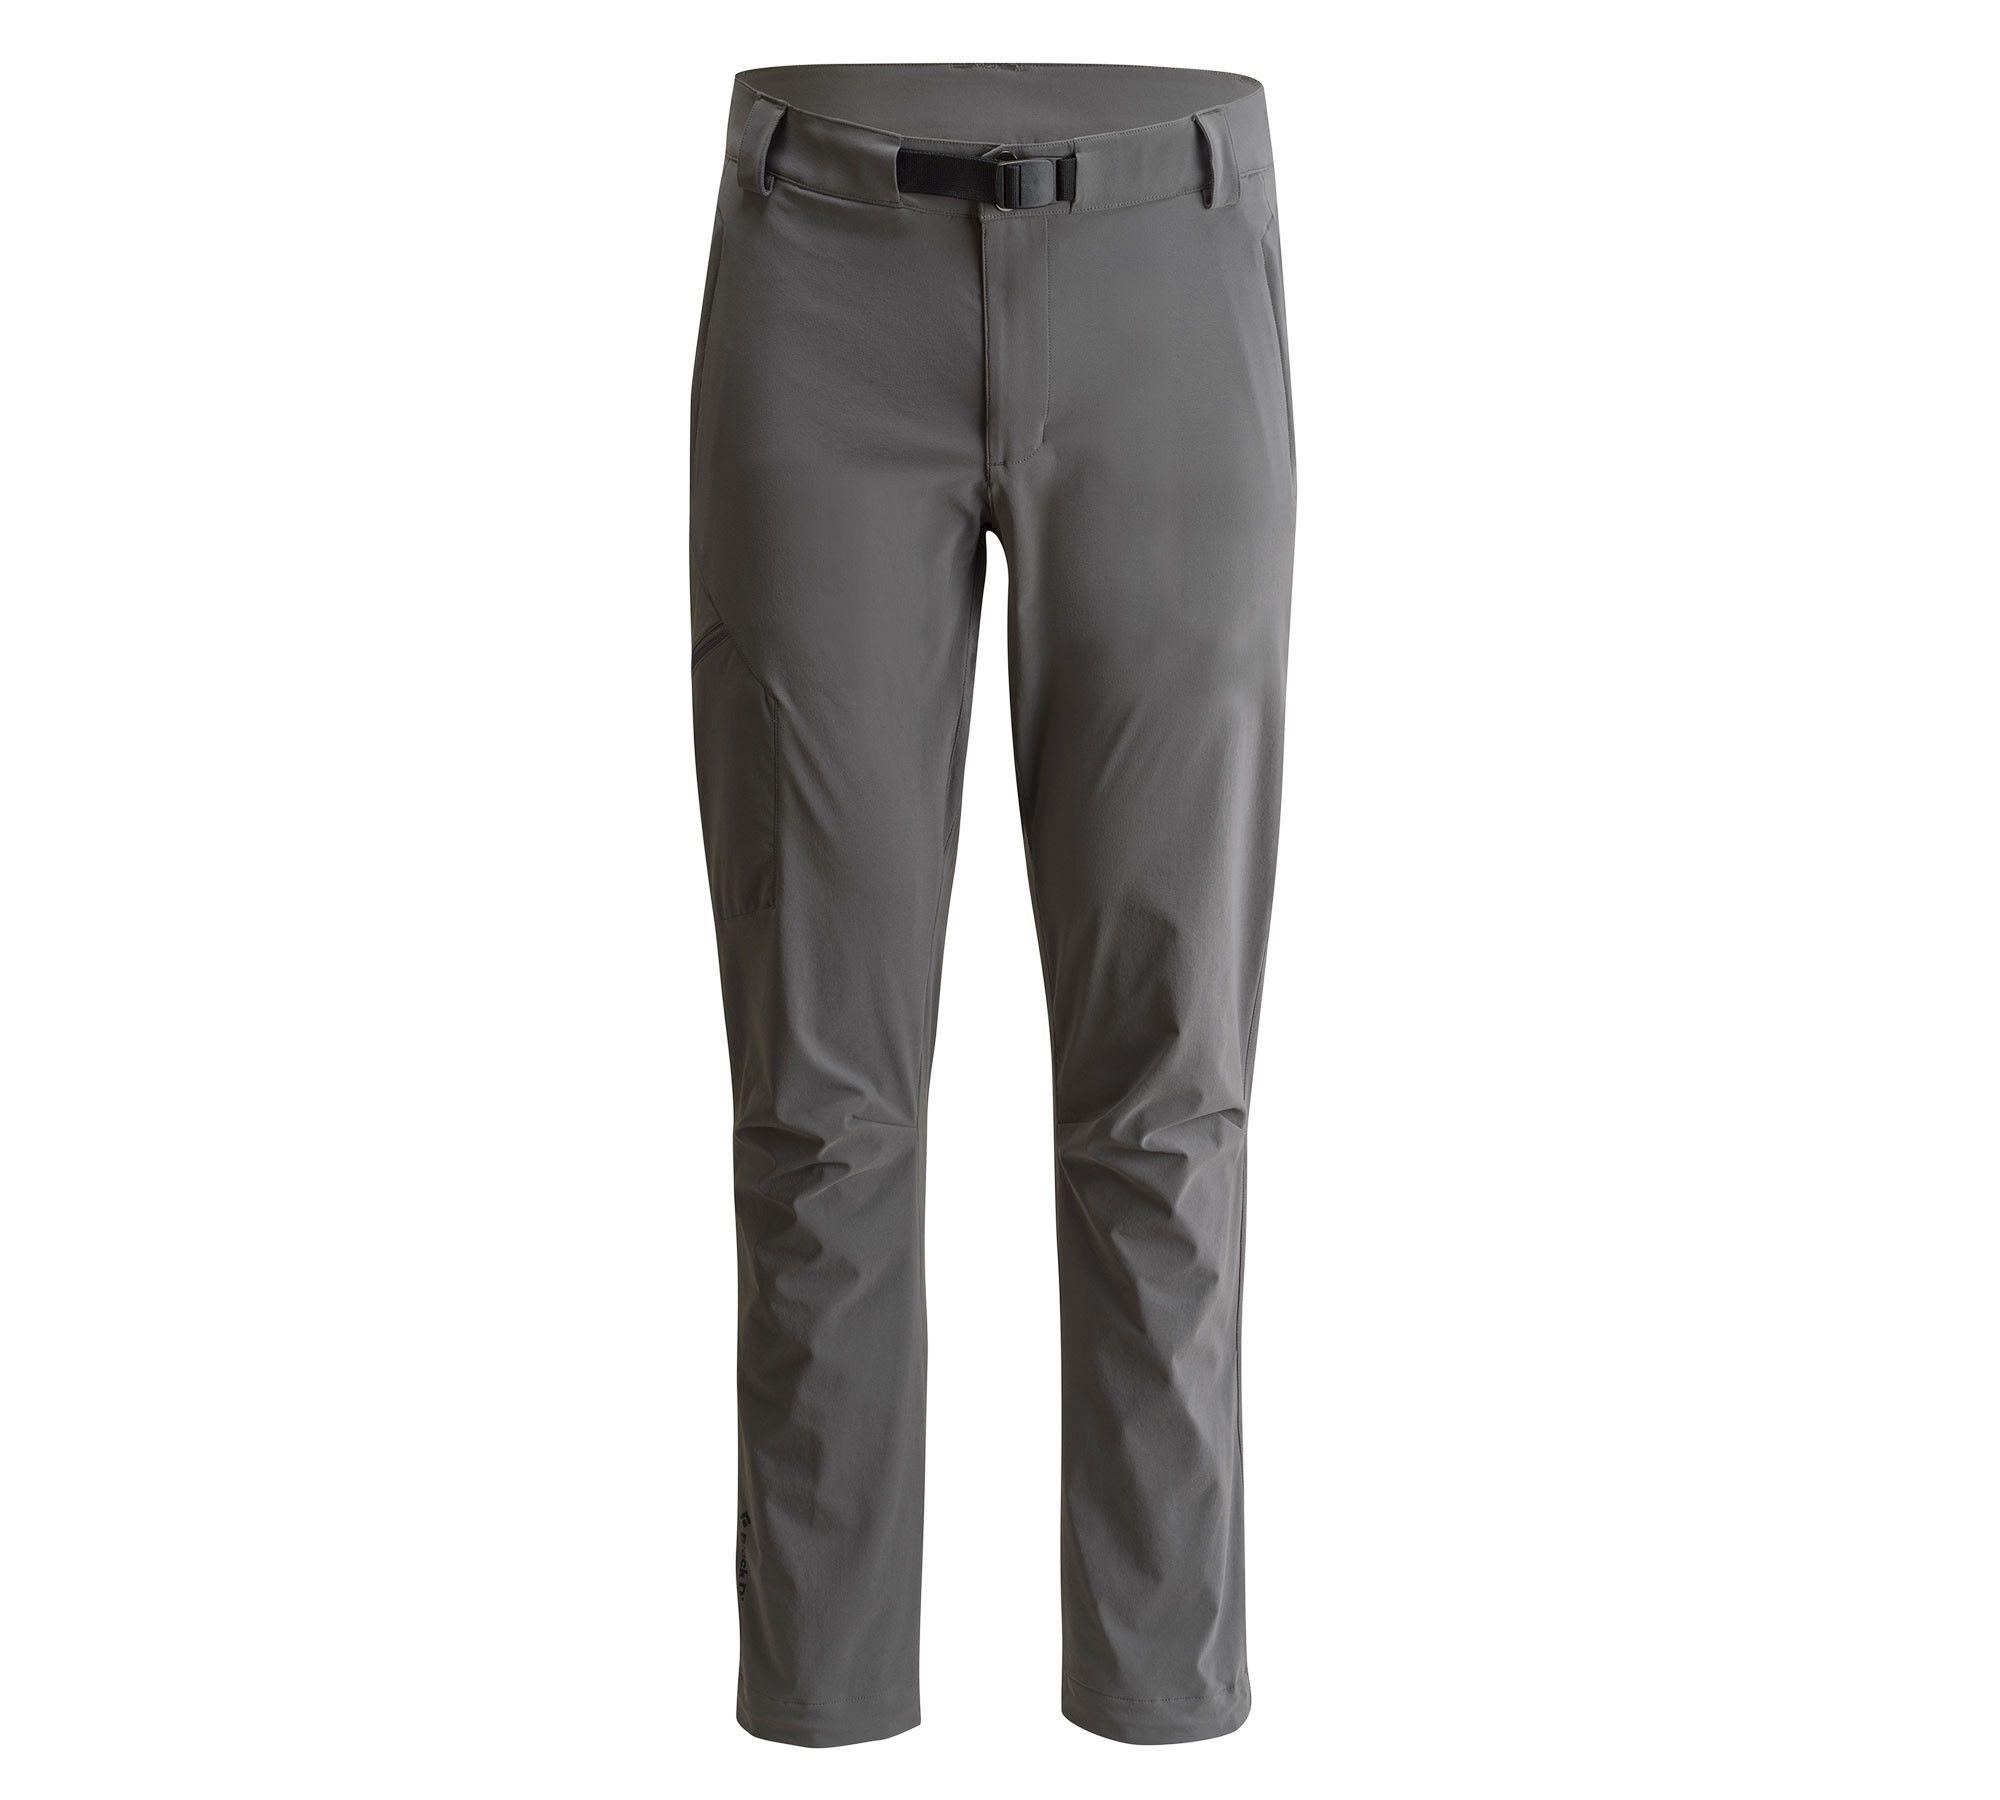 Black Diamond Alpine Pants Grau, Male Hose, L